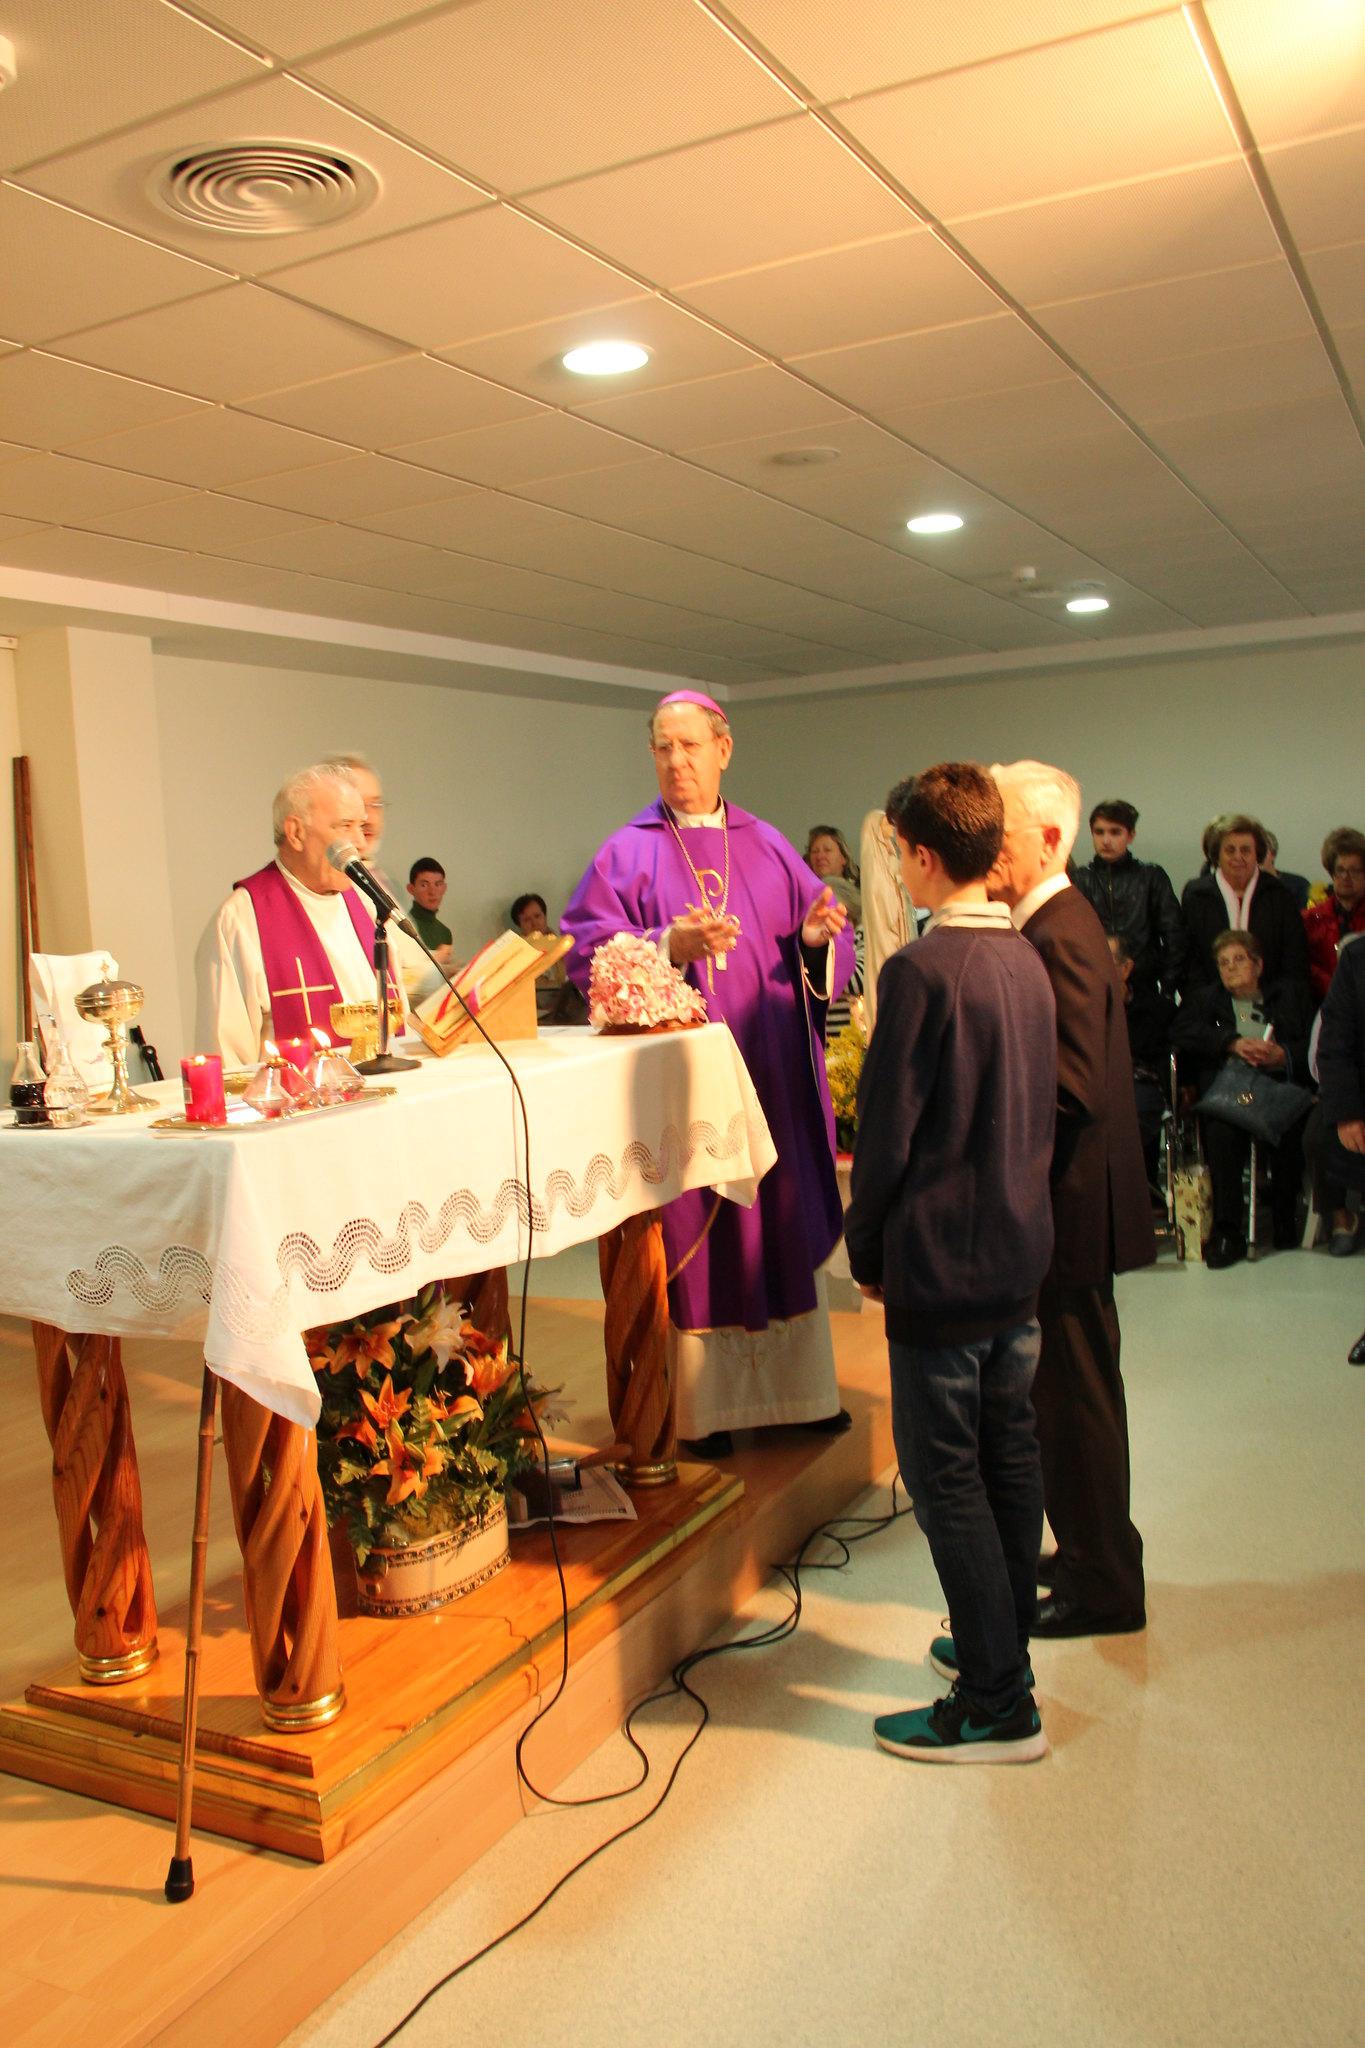 (2016-02-13) - Inauguración Virgen De Lourdes, La Molineta - Archivo La Molineta (038)